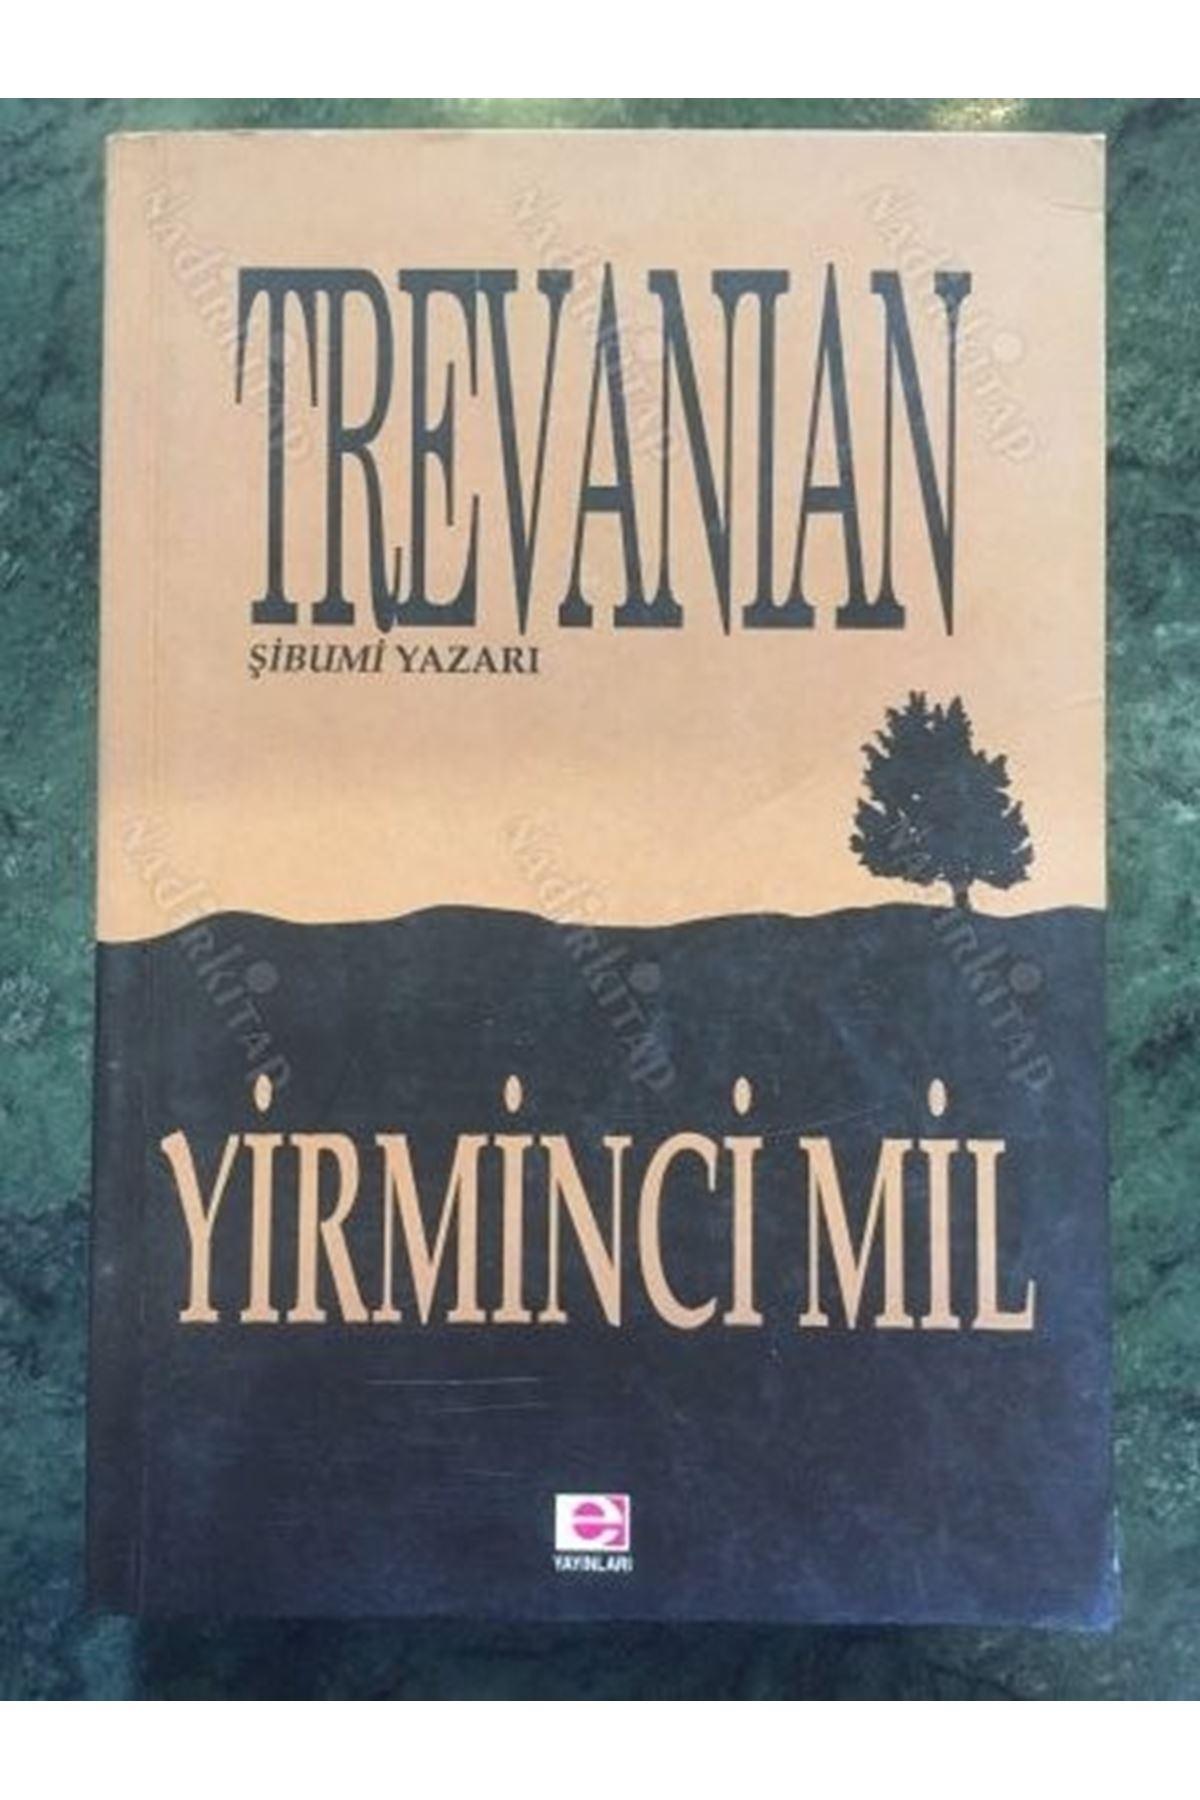 TREVANIAN - YİRMİNCİ MİL